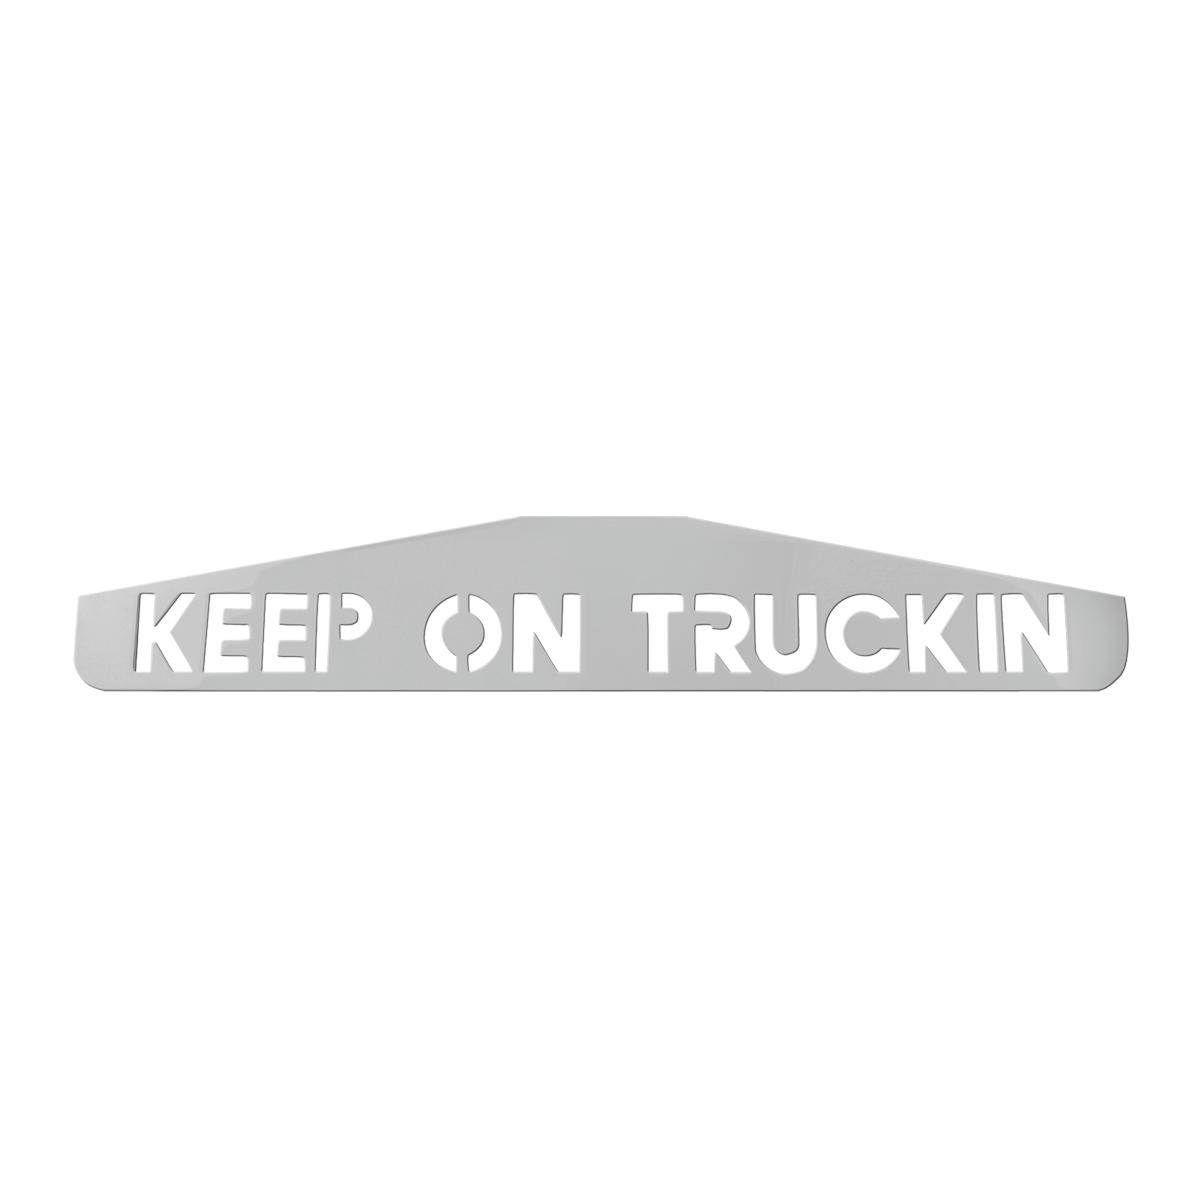 """KEEP ON TRUCKING"" Chrome Mud Flap Weights for Peterbilt & Kenworth, Pair"